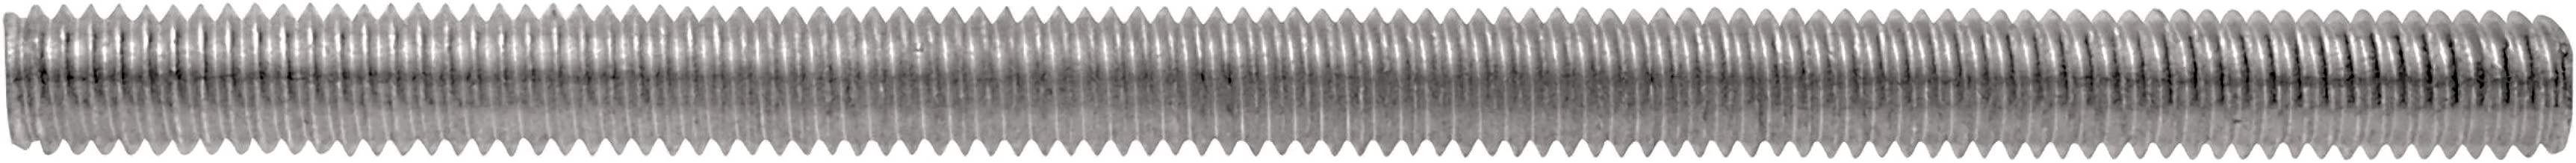 Hillman 44817 8-32 x 6-Inch Zinc Threaded Rod, 10-Pack